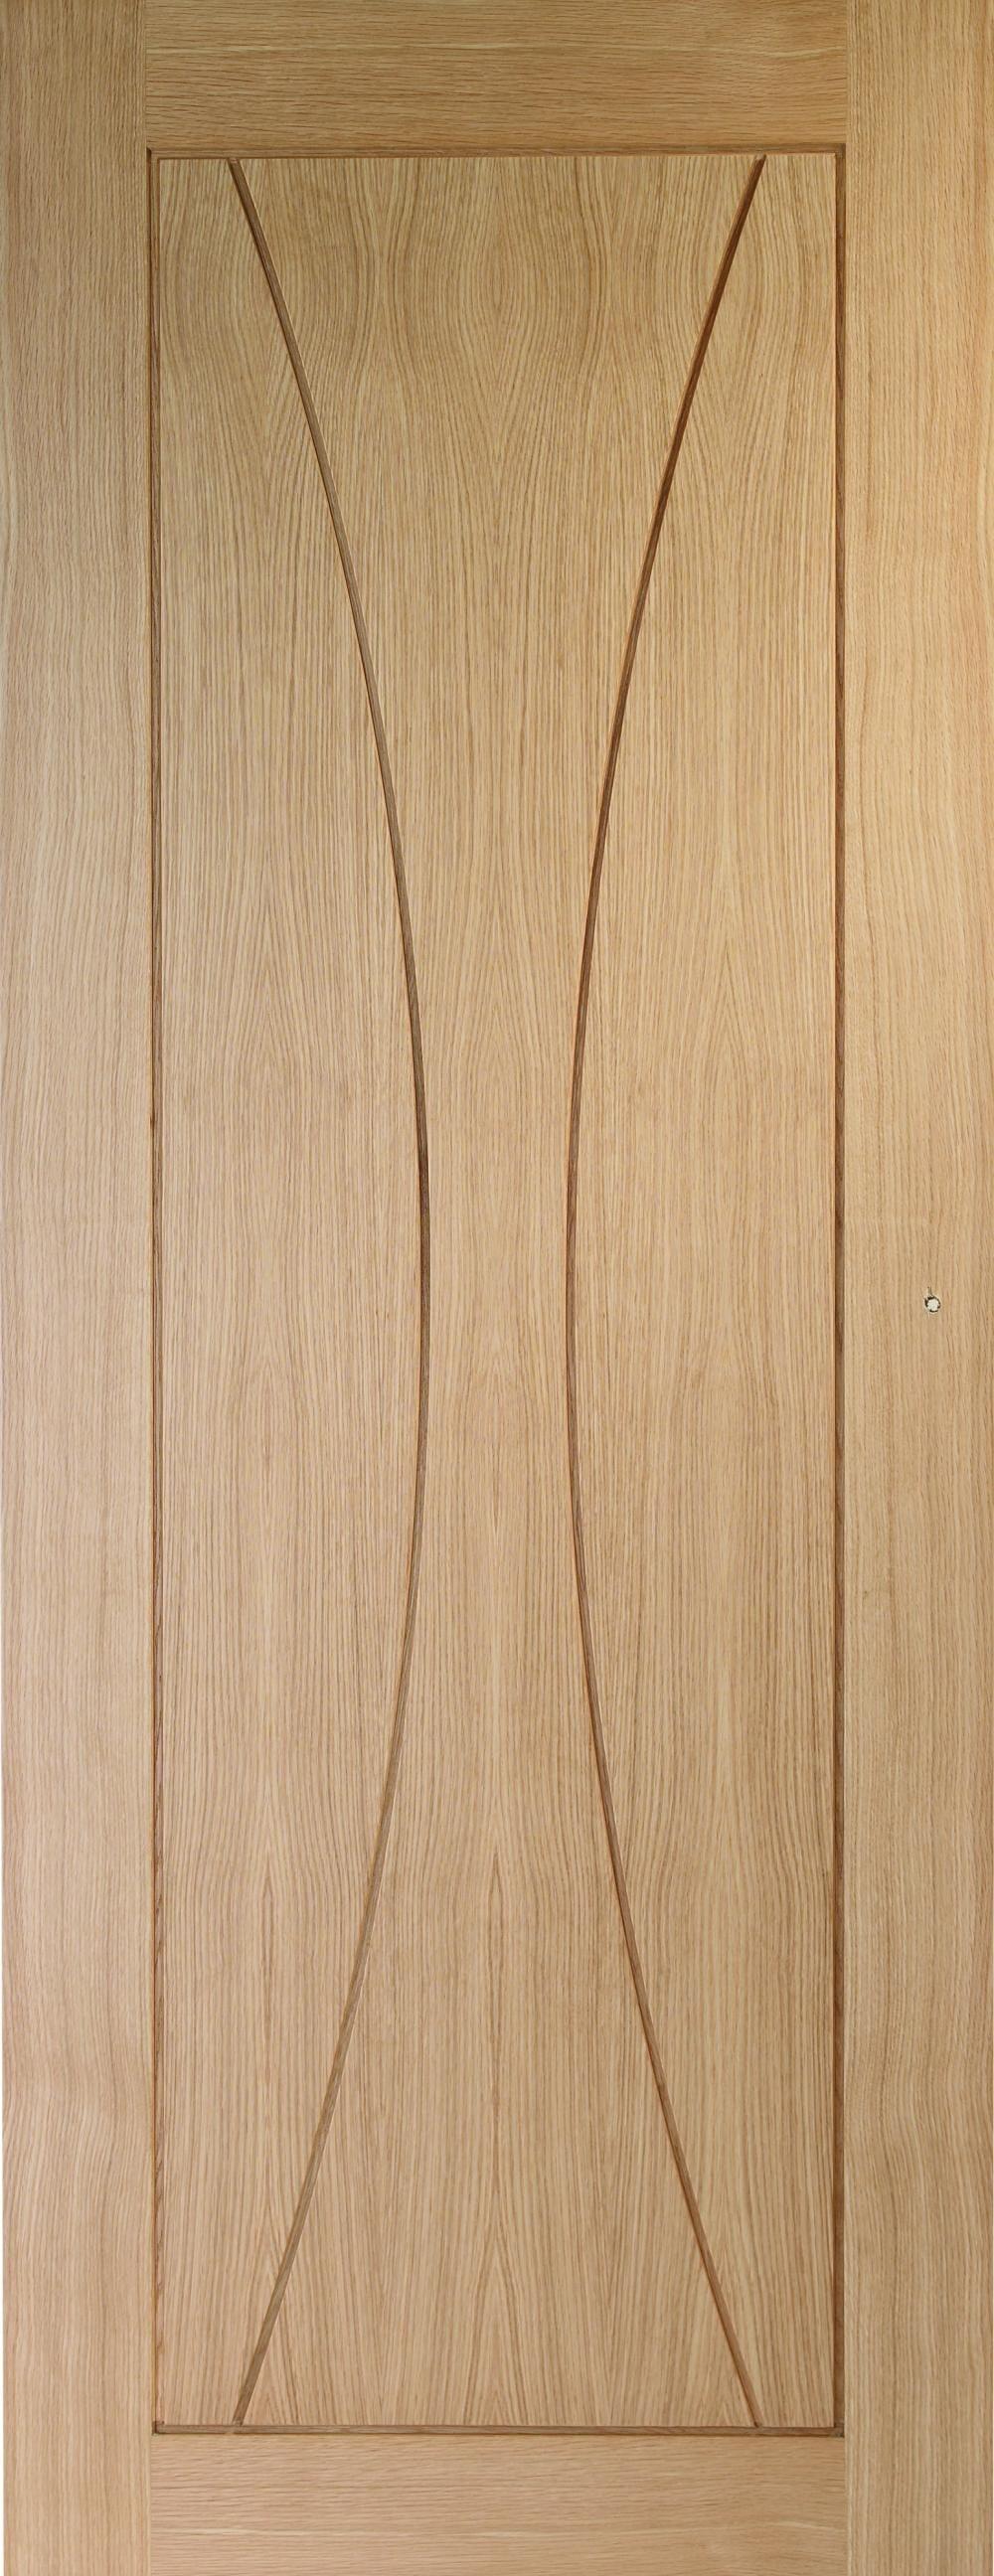 Verona Oak Image